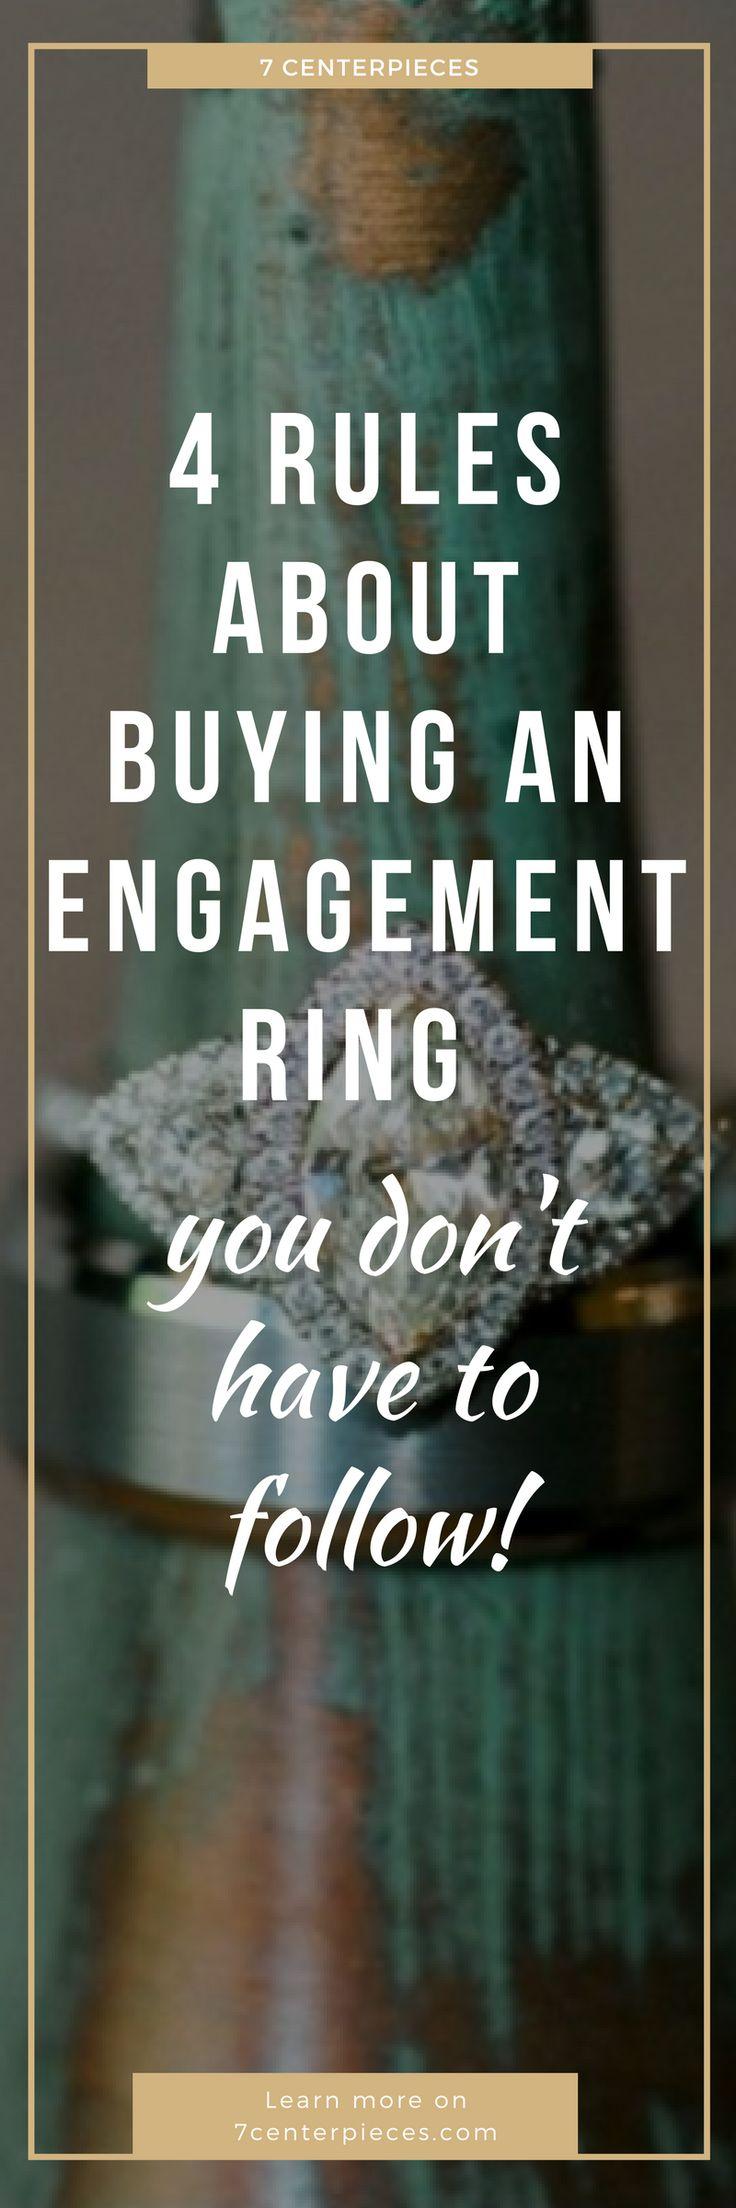 5252 best Diamonds images on Pinterest | Commitment rings ...